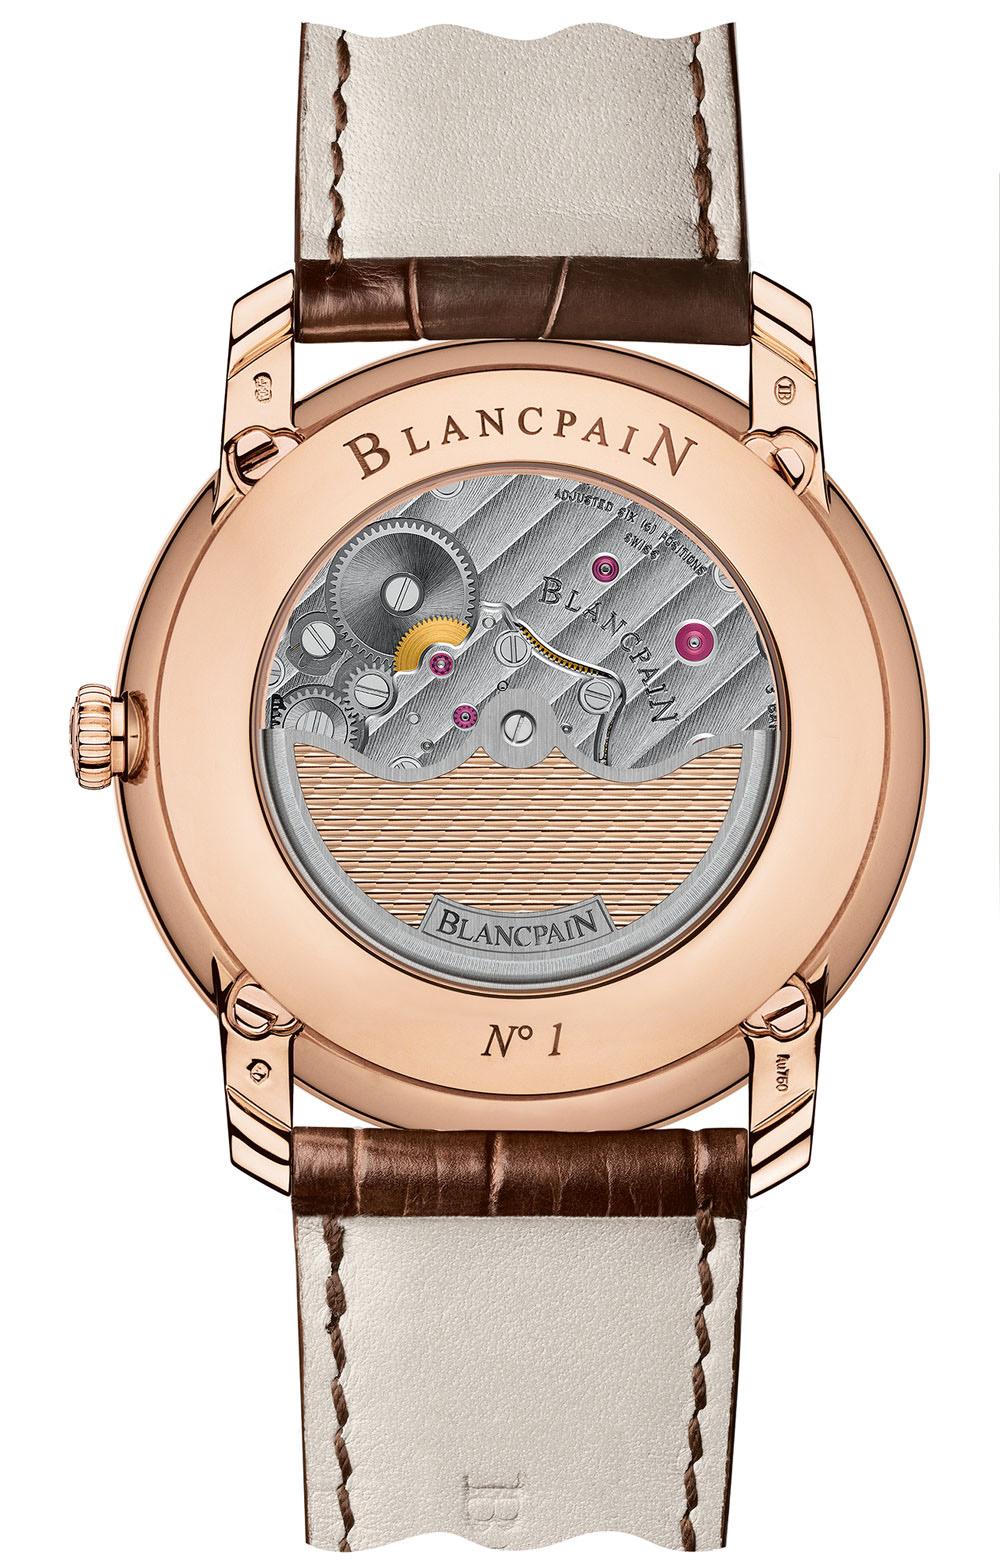 Blancpain Villeret Collection 8 Day Perpetual Calendar - Caseback